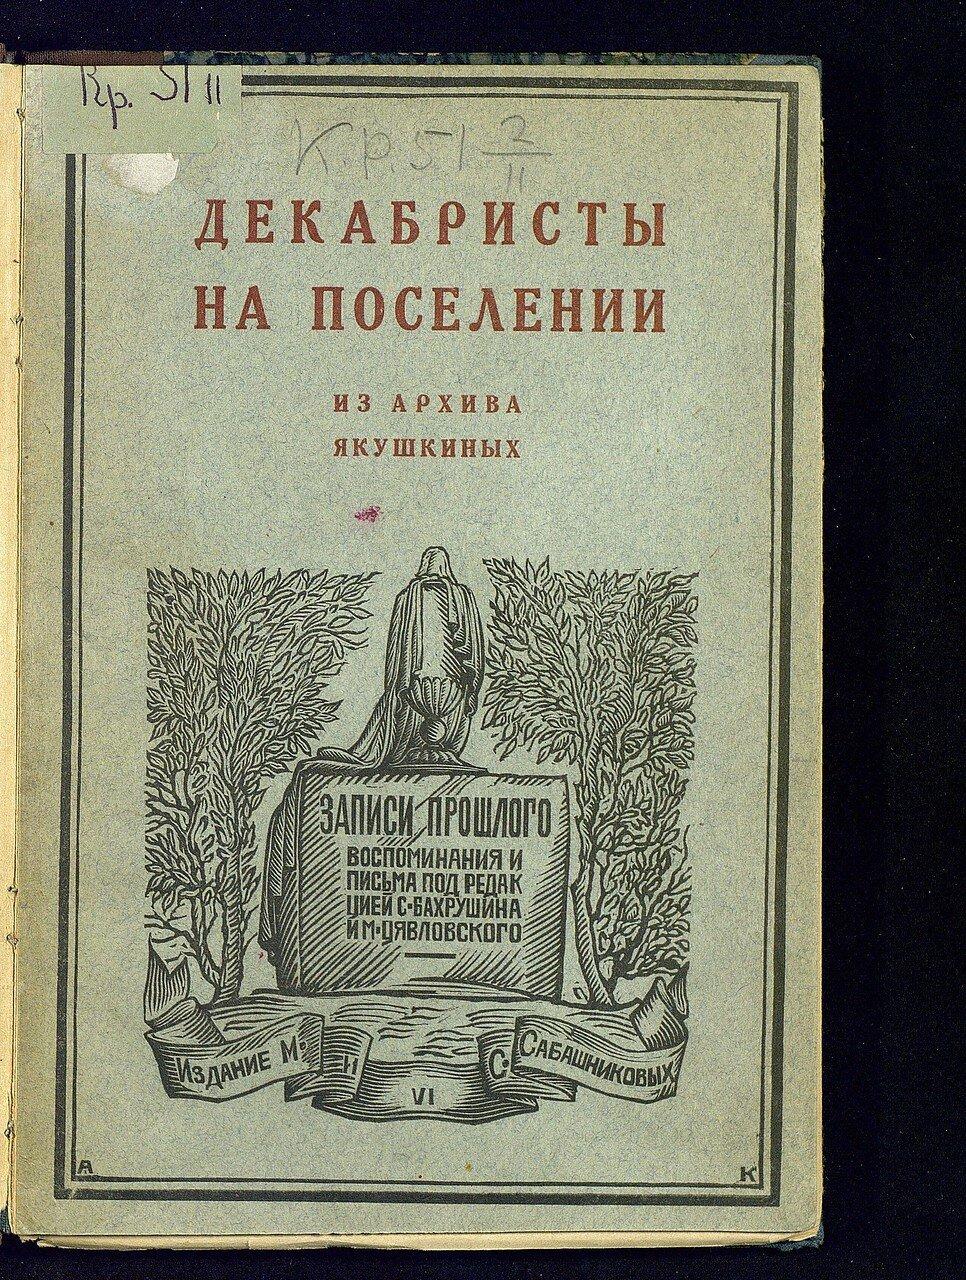 https://img-fotki.yandex.ru/get/893240/199368979.a0/0_214302_7e0a2cf8_XXXL.jpg